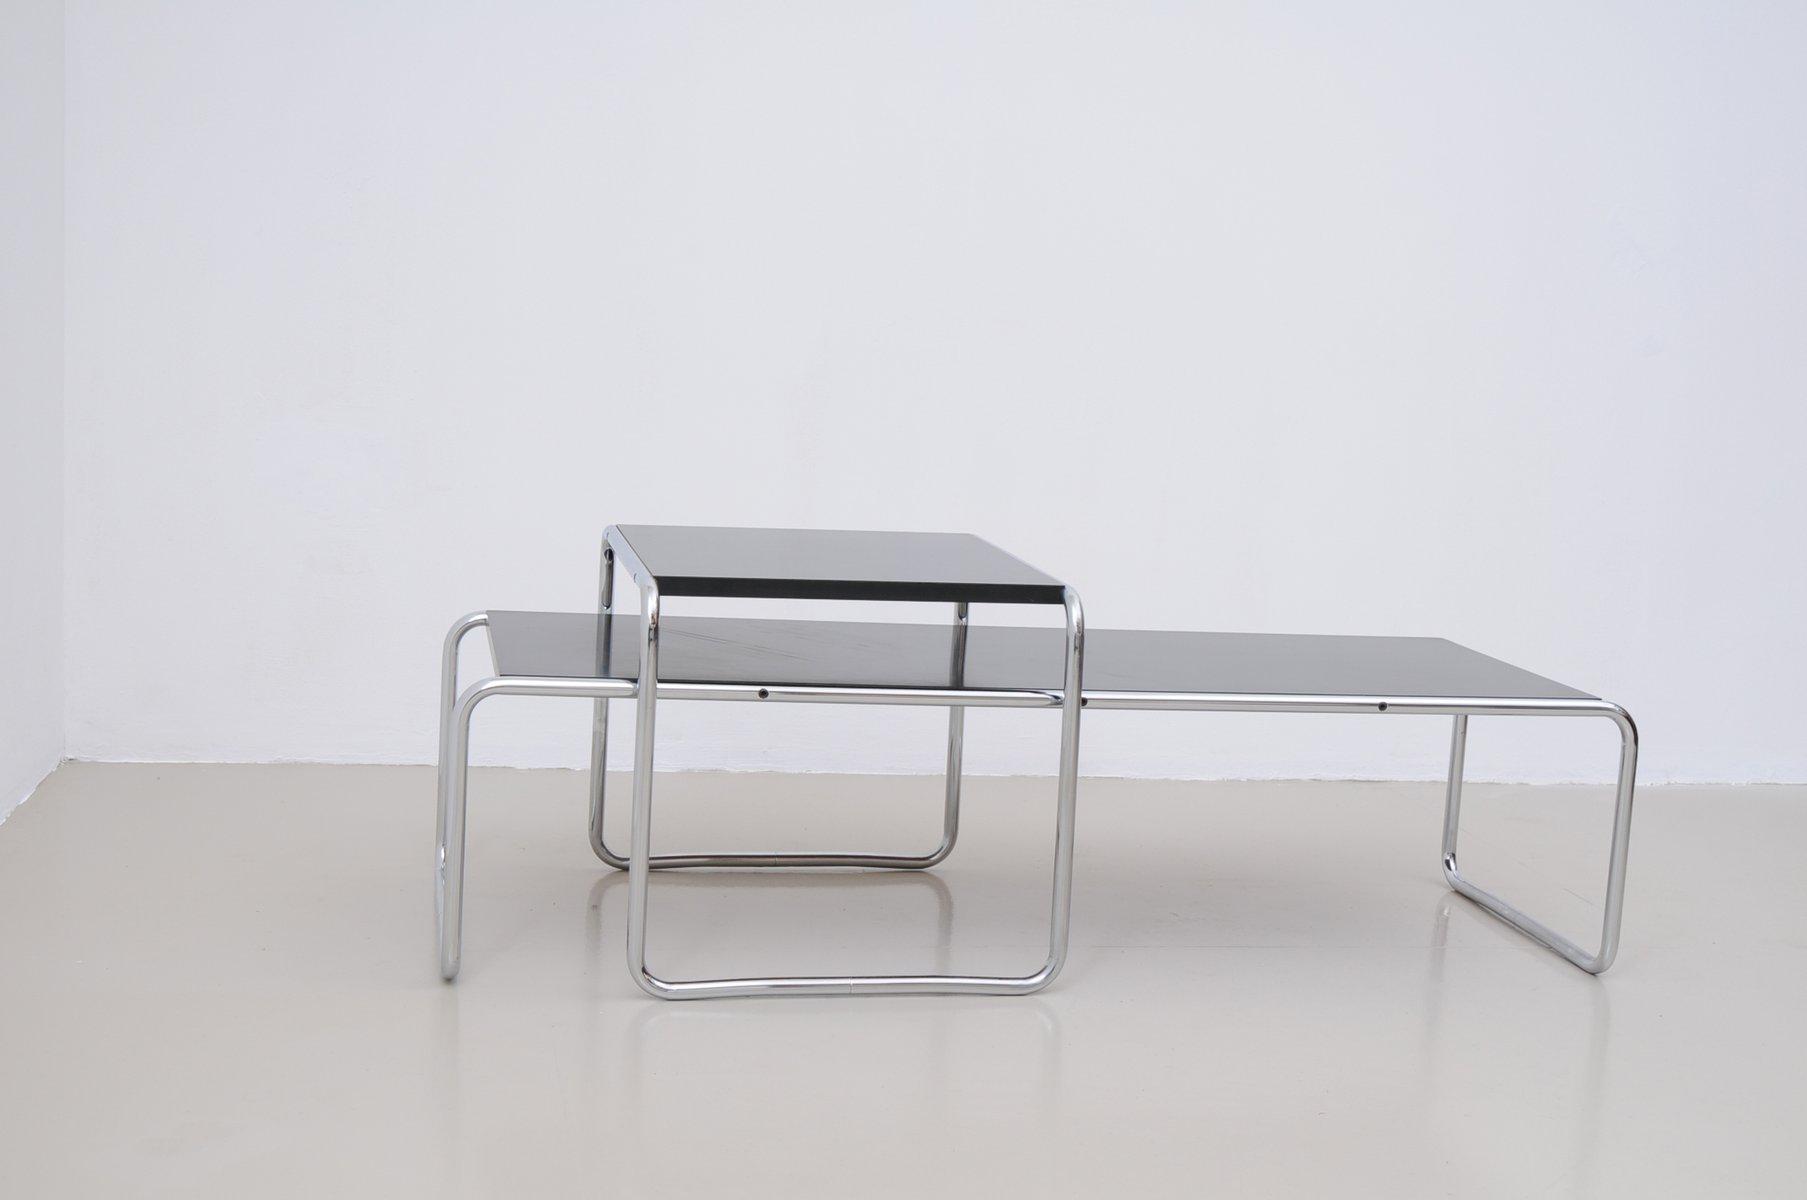 Vintage Italian Laccio Black Tables 1 & 2 by Marcel Breuer for